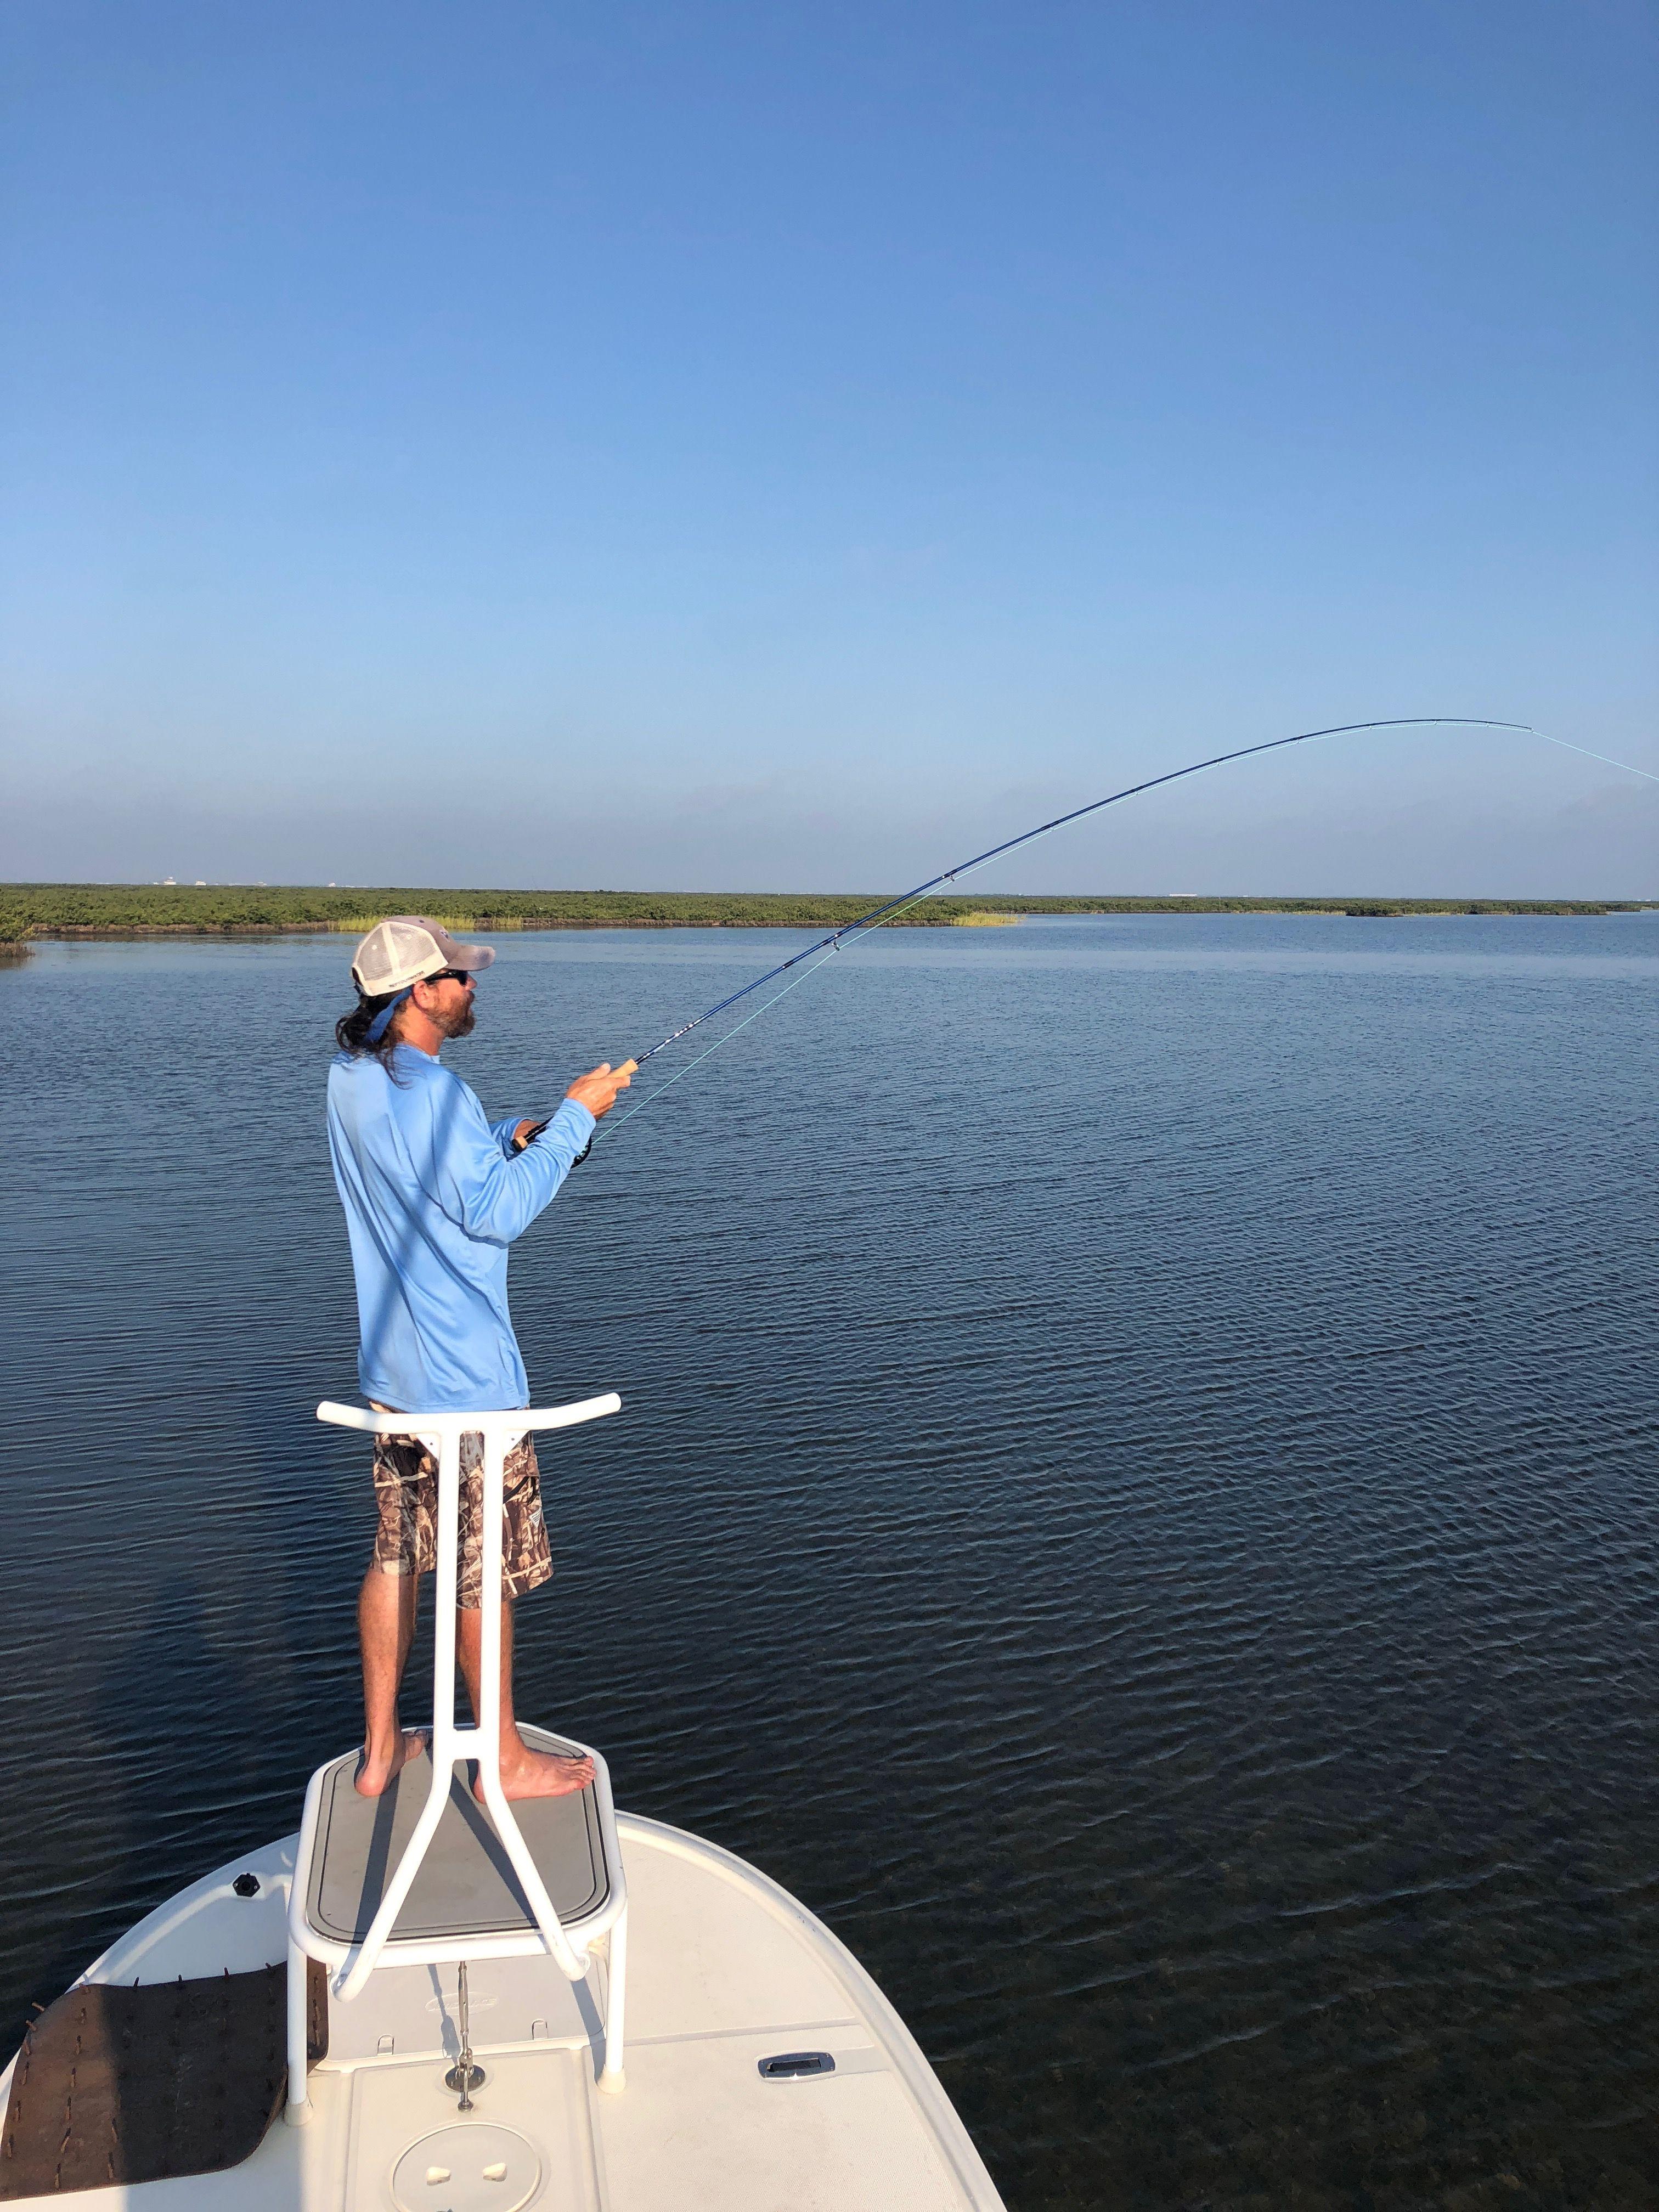 Fly Fishing In Texas Saltwater Fishing Fly Fishing Saltwater Flies